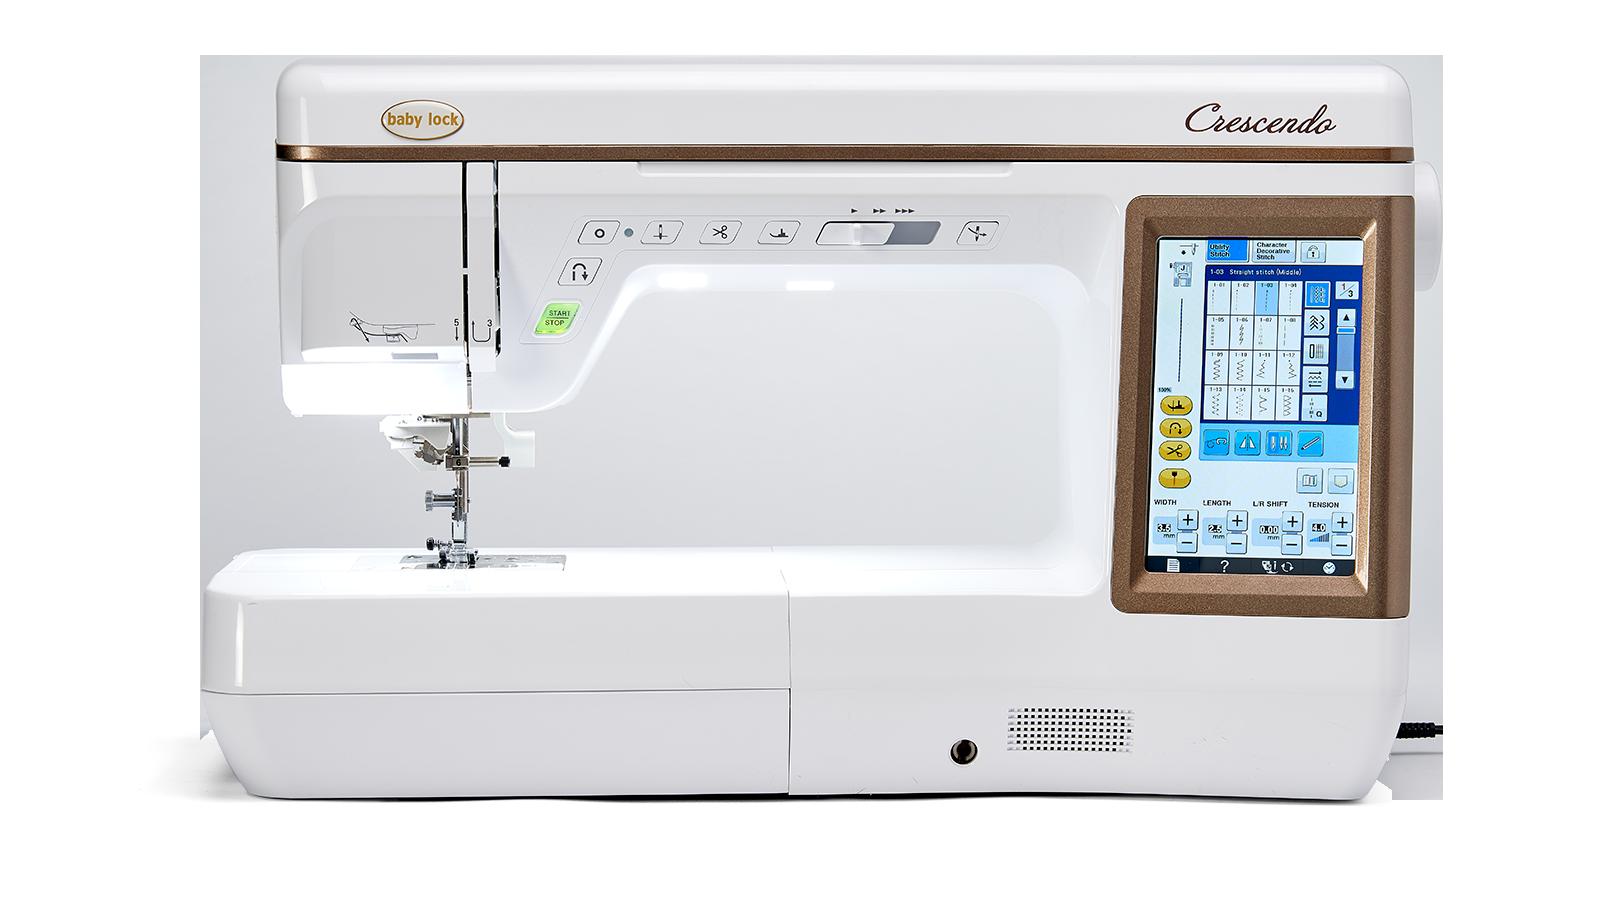 Baby Lock Crescendo - Sewing & Quilting Machine - BLCR